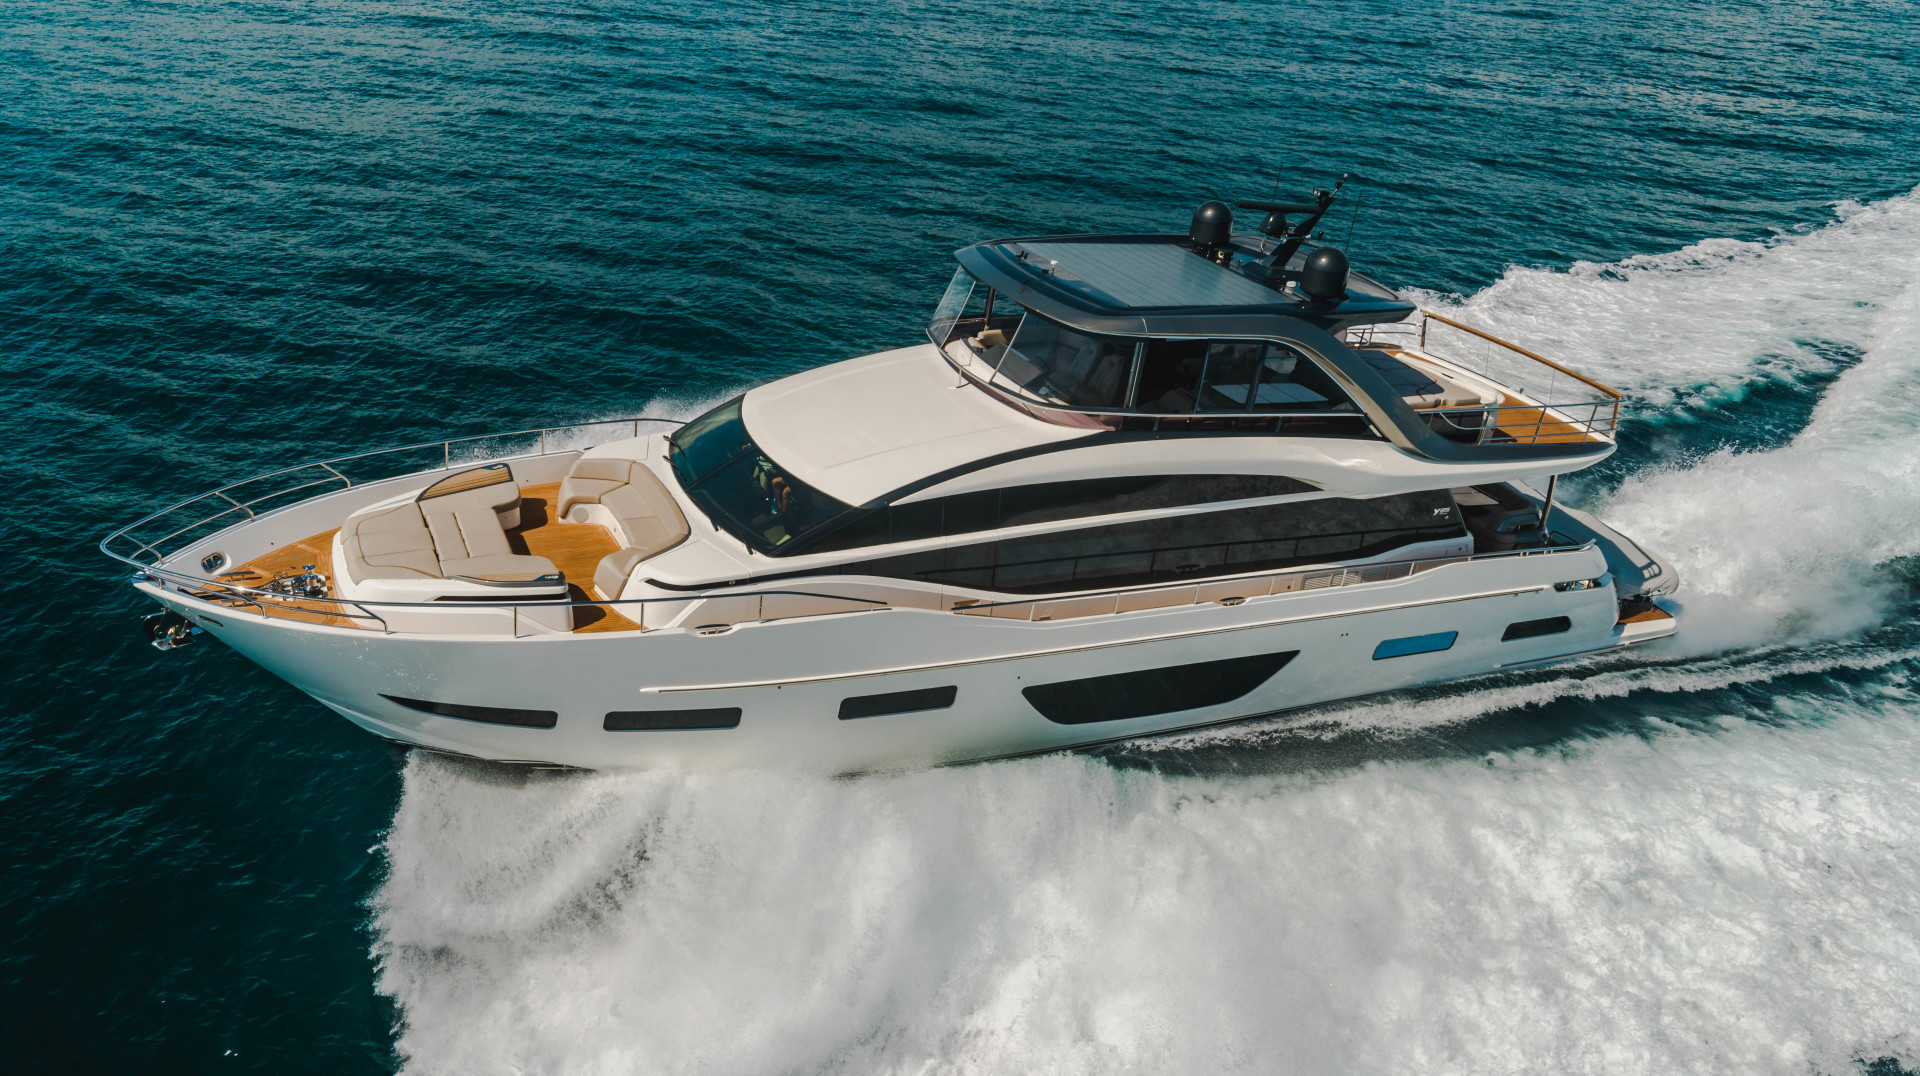 Princess-Y85  2019-Splash Delray Beach-Florida-United States-1631599 | Thumbnail